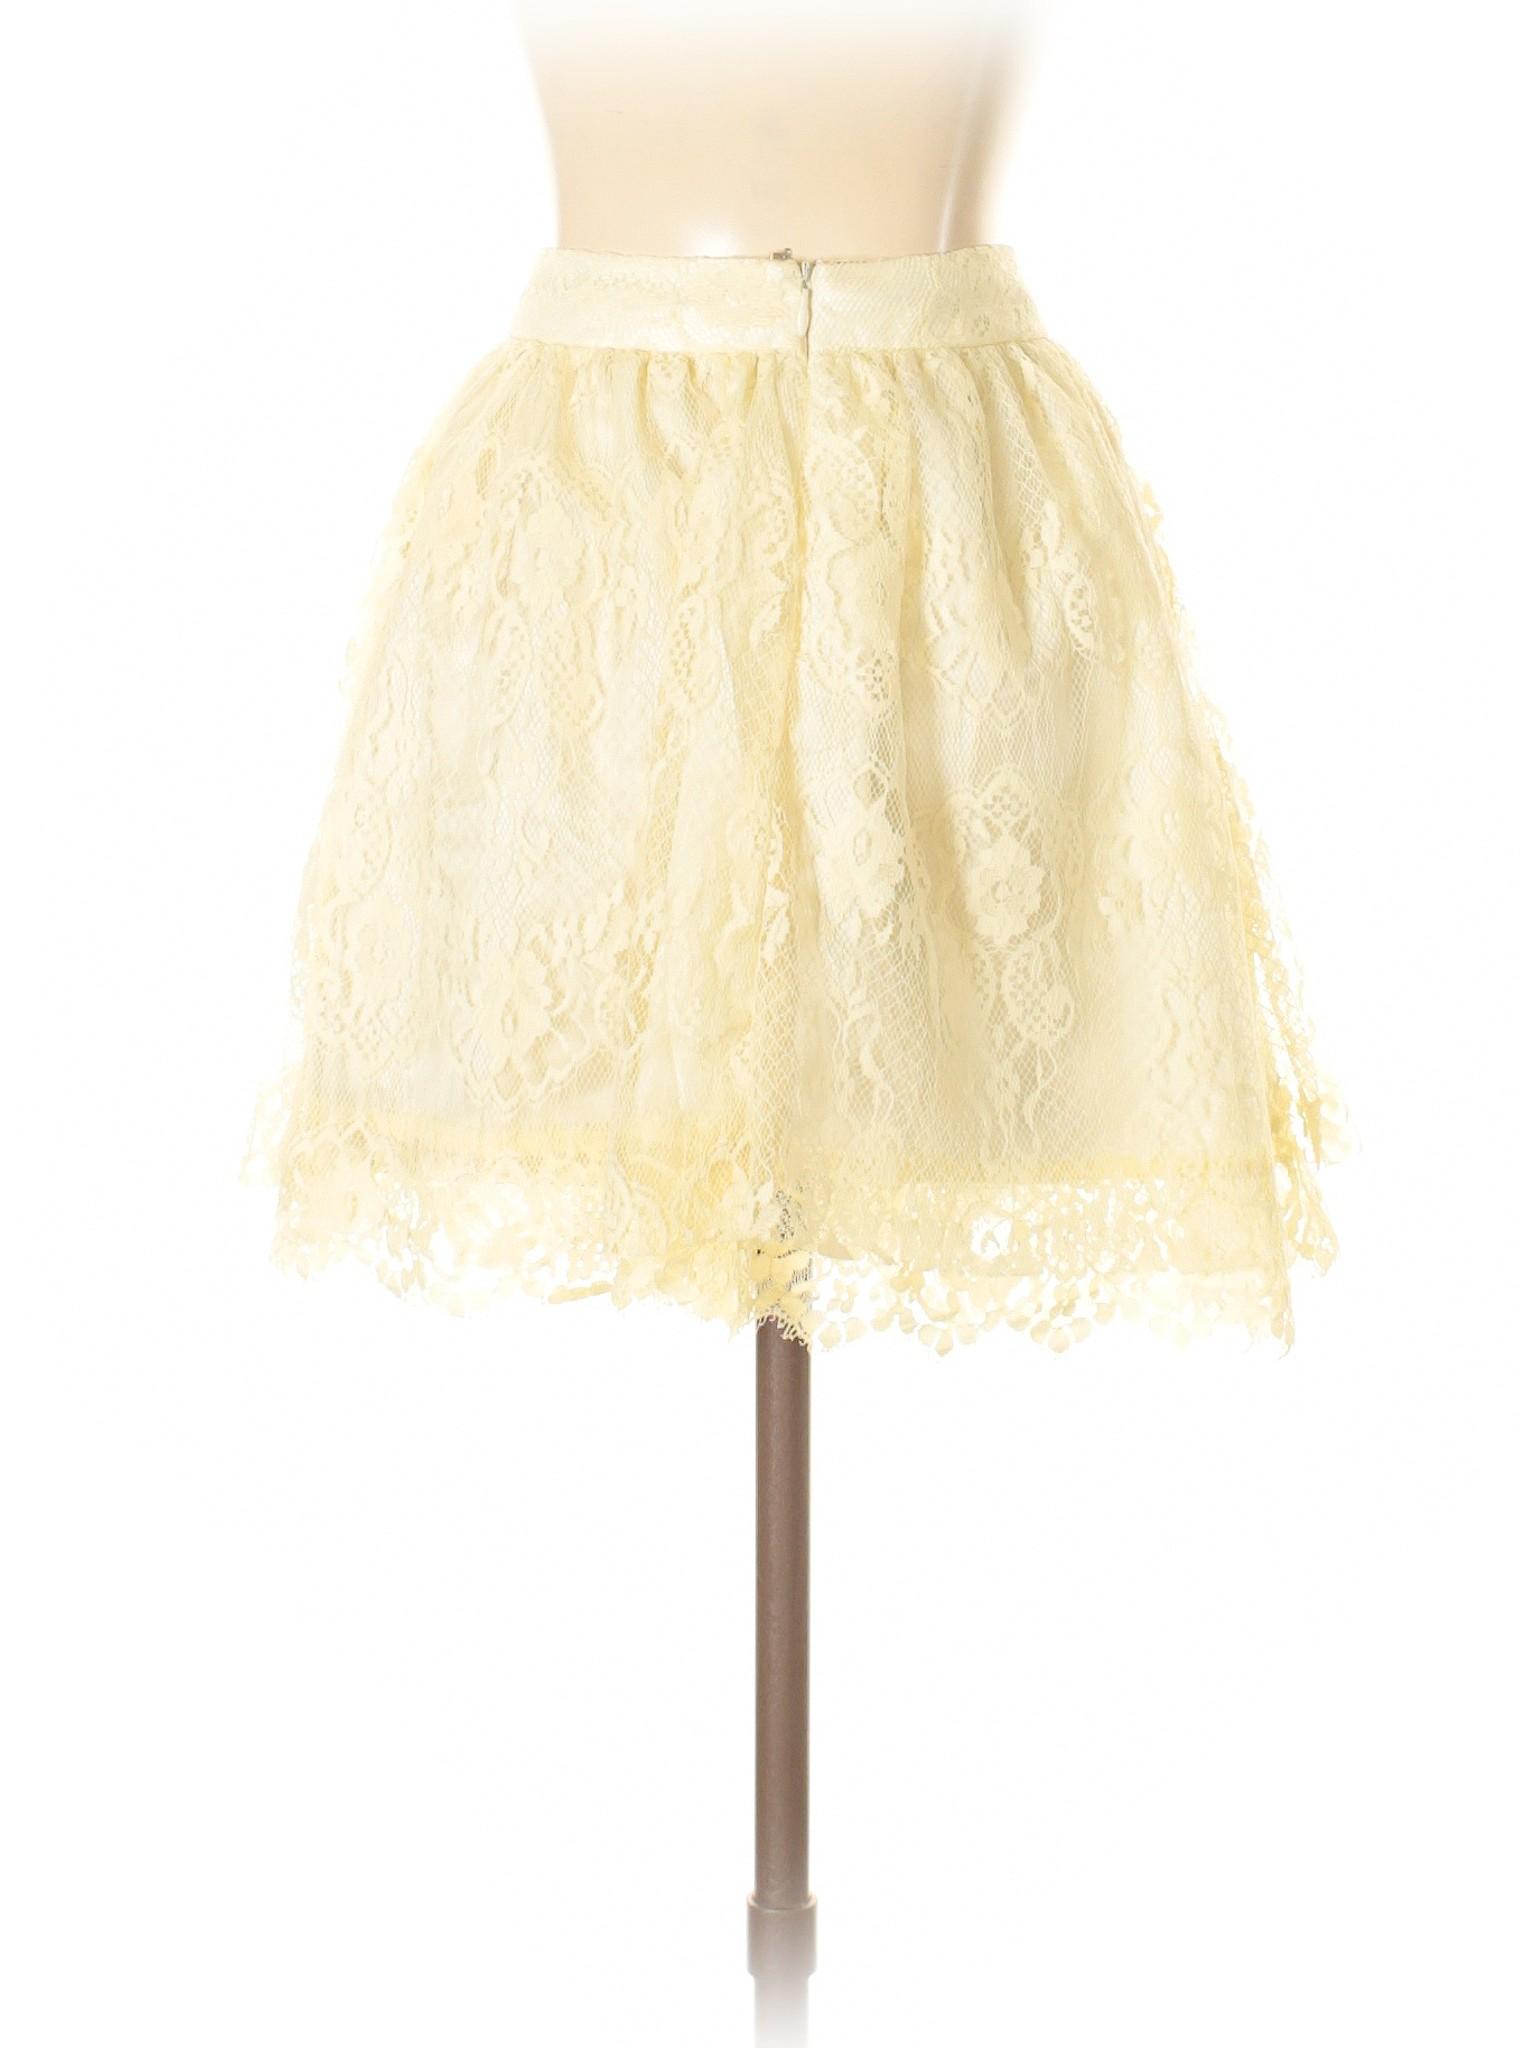 Boutique Casual Boutique Casual Skirt Casual Souci Souci Skirt Boutique Boutique Sans Sans Souci Skirt Sans ppqHWxwR